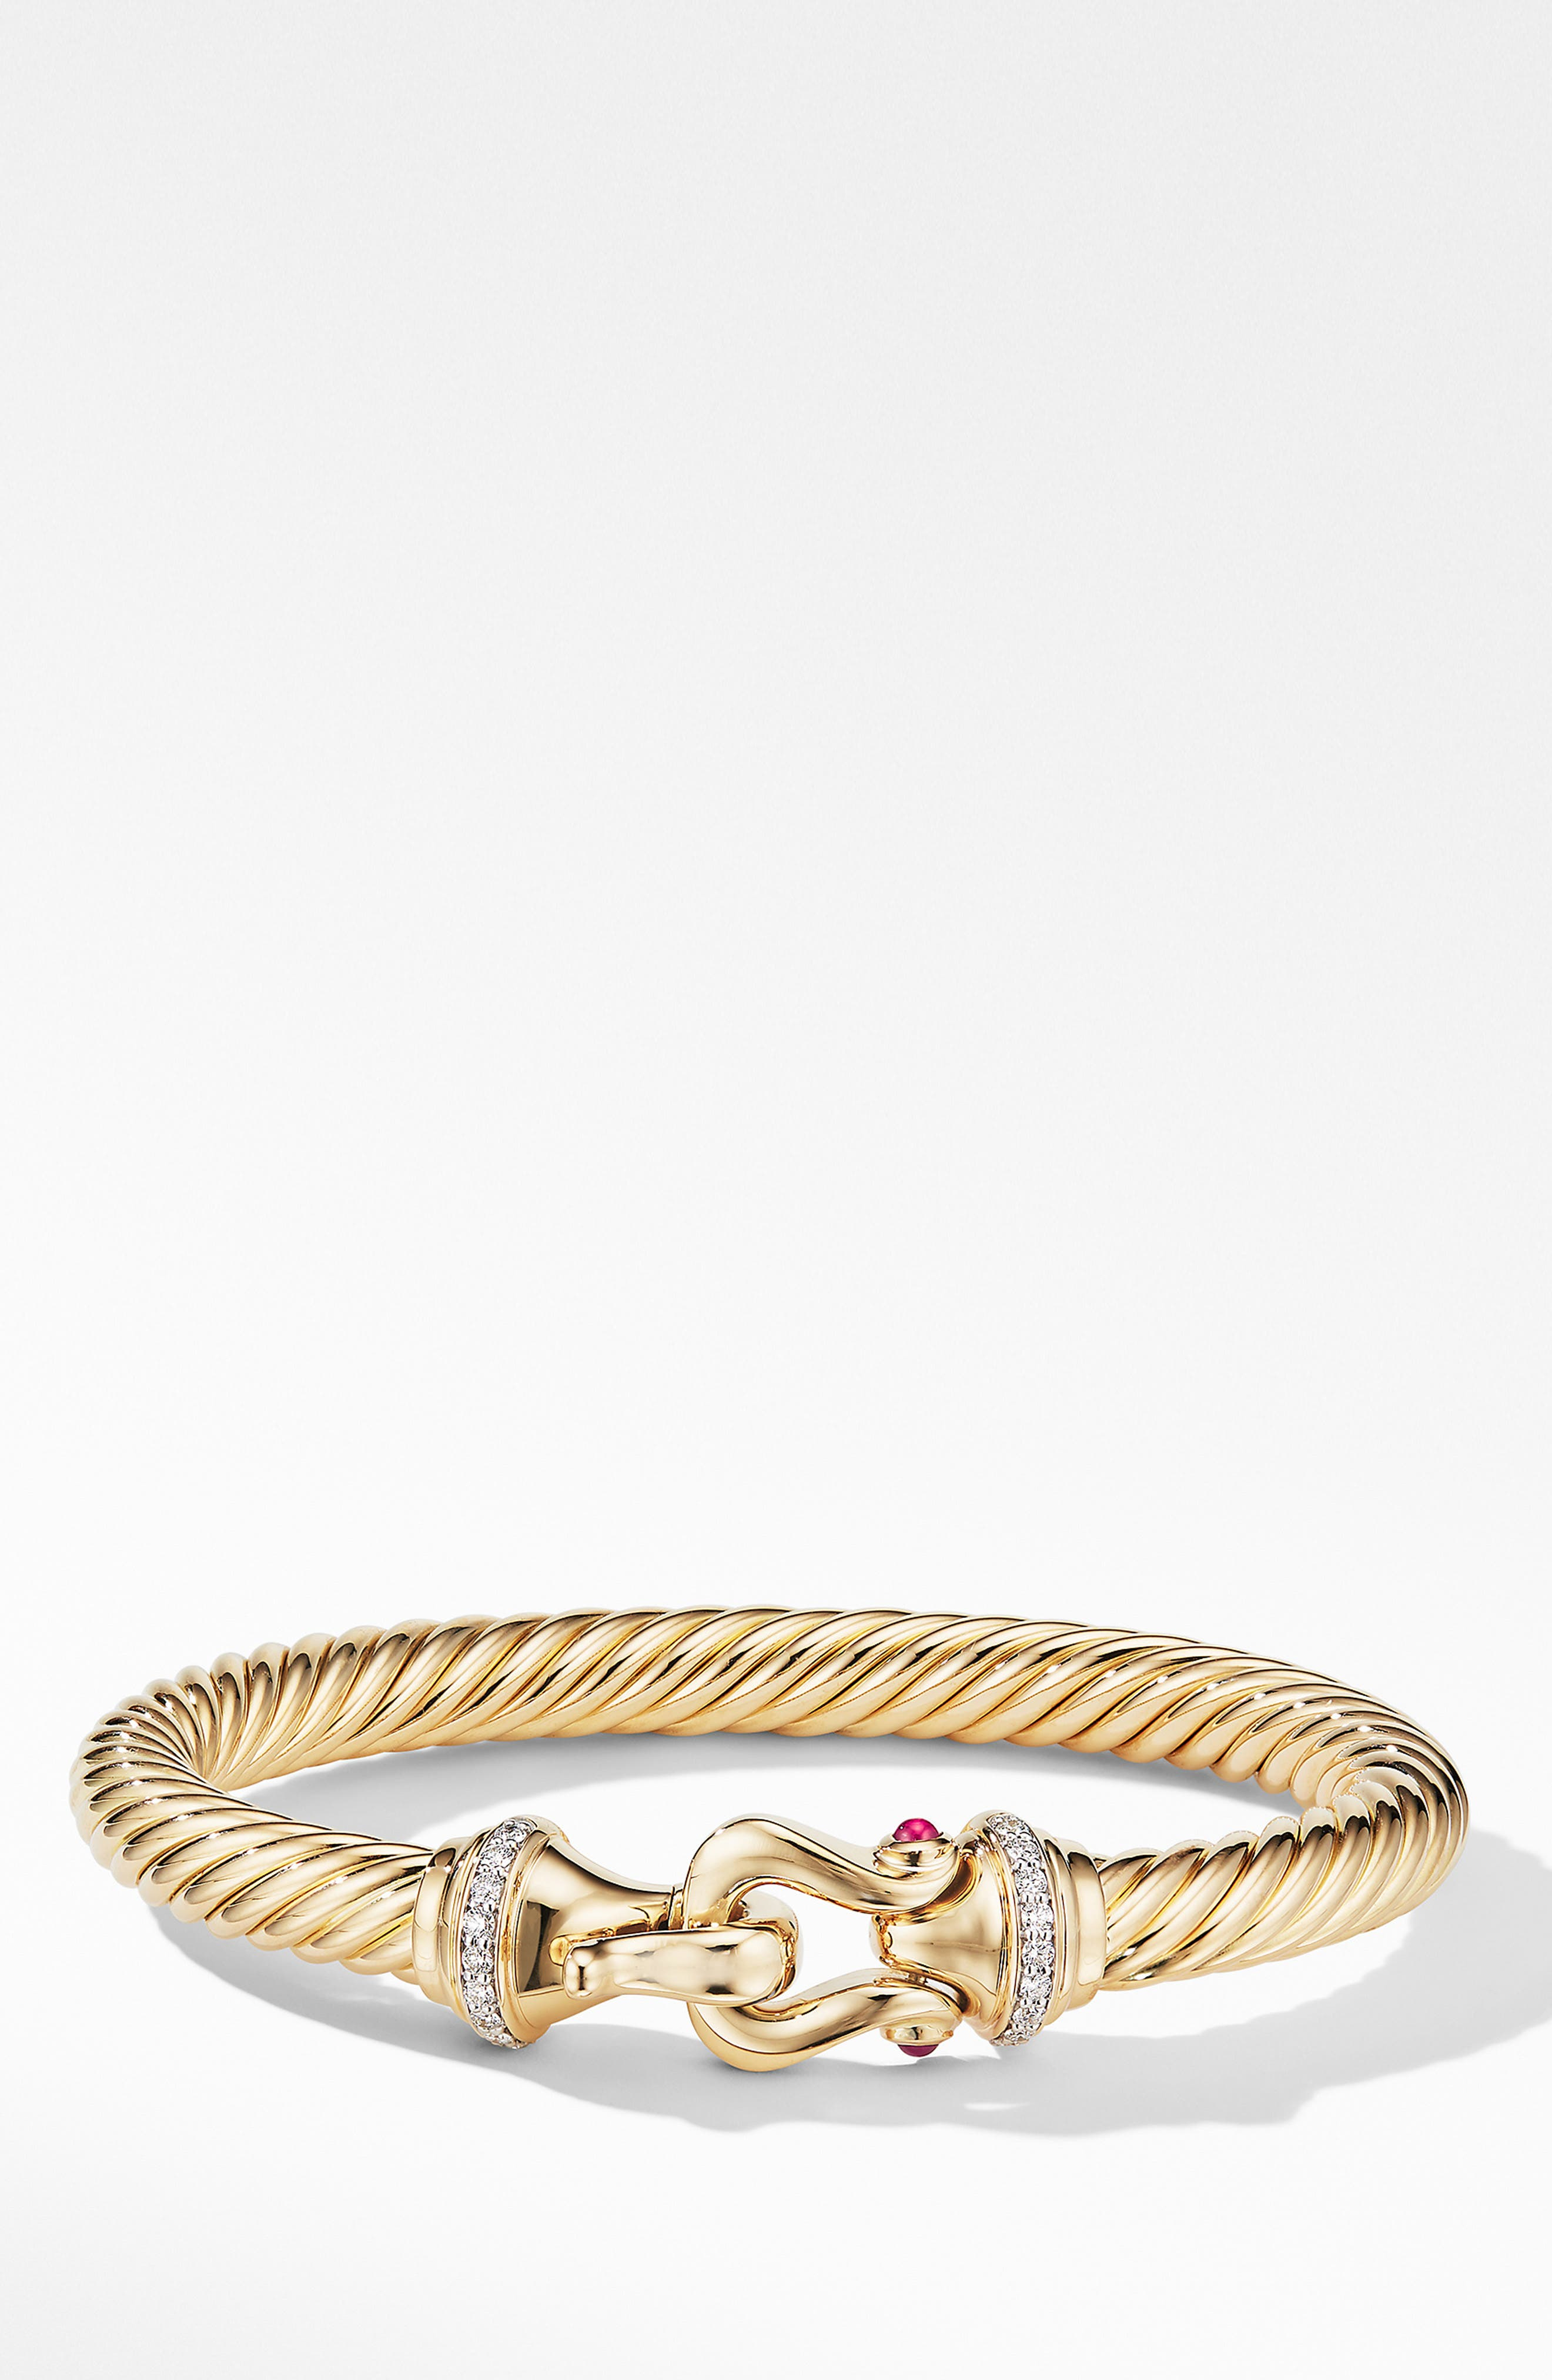 DAVID YURMAN, Cable Buckle Bracelet with Diamonds, Main thumbnail 1, color, GOLD/ RUBY/ DIAMOND